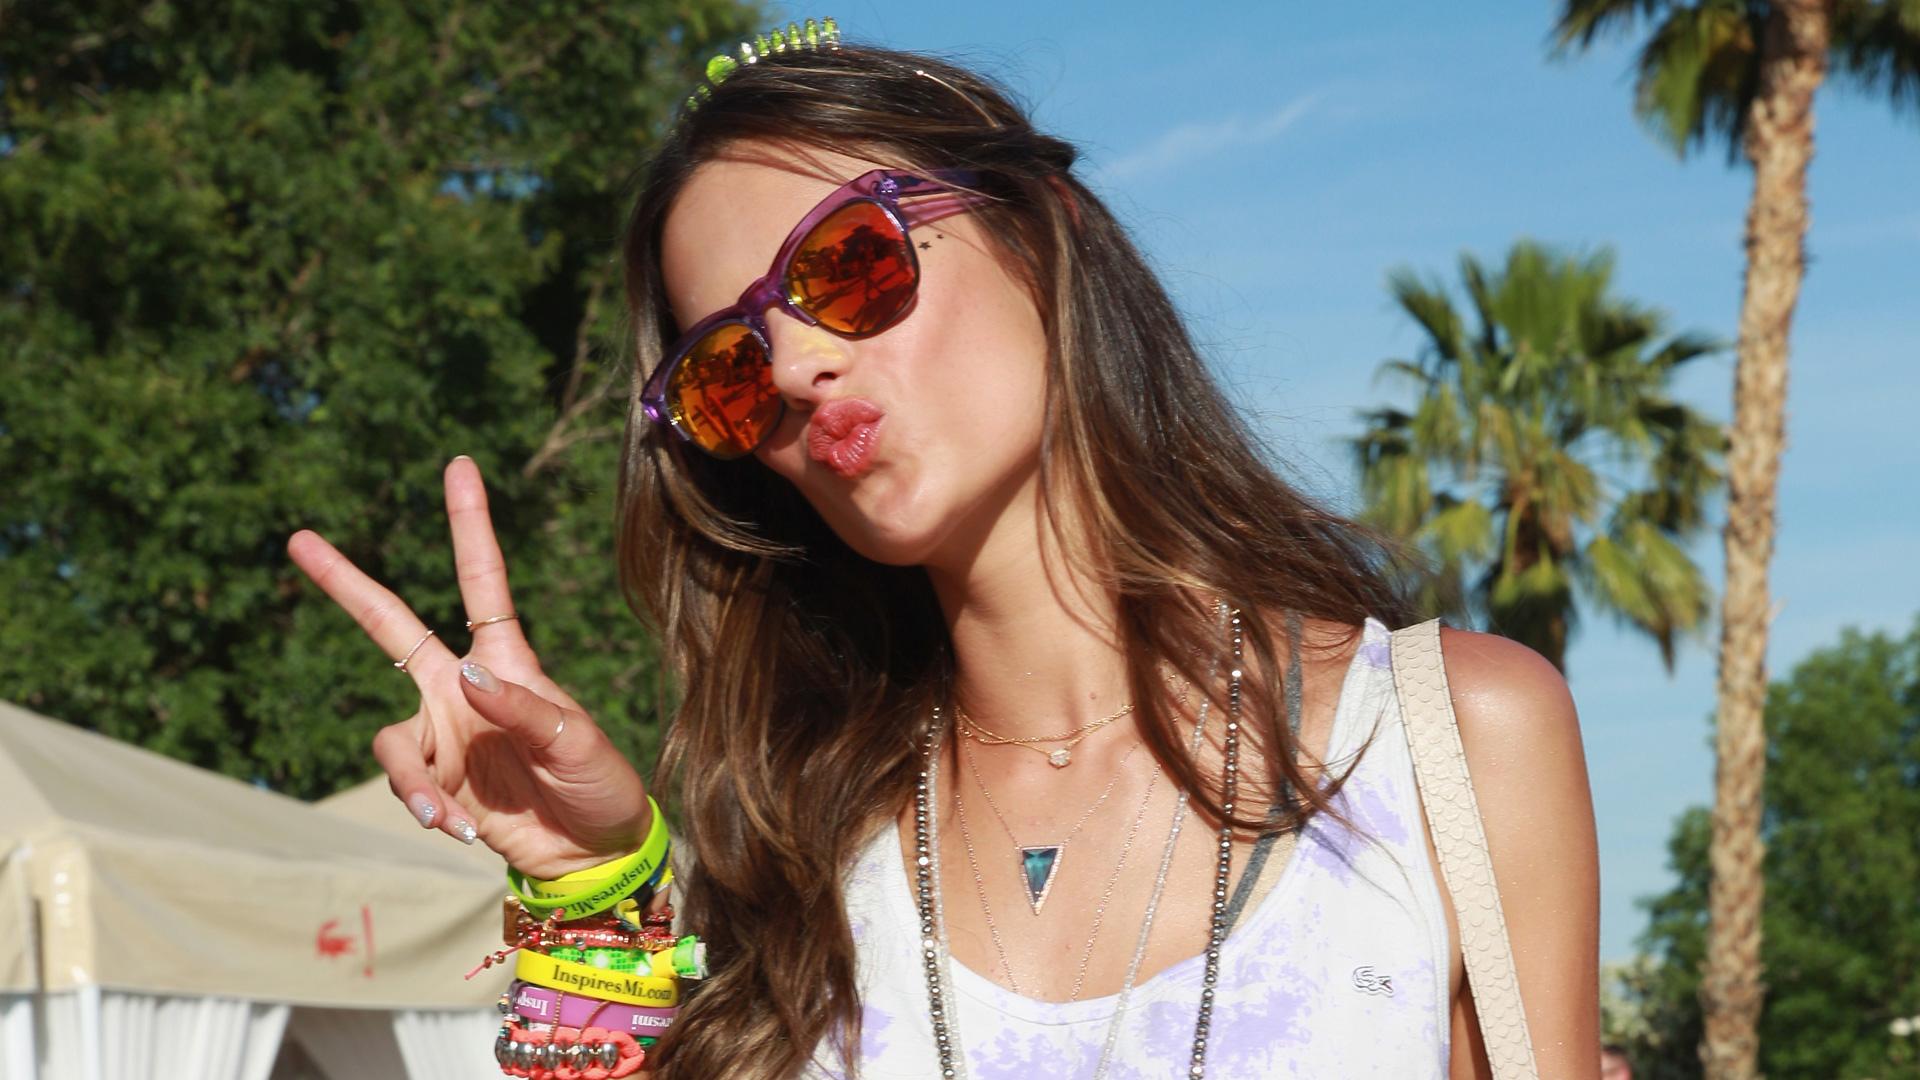 Alessandra Ambrosio wearing sunglasses